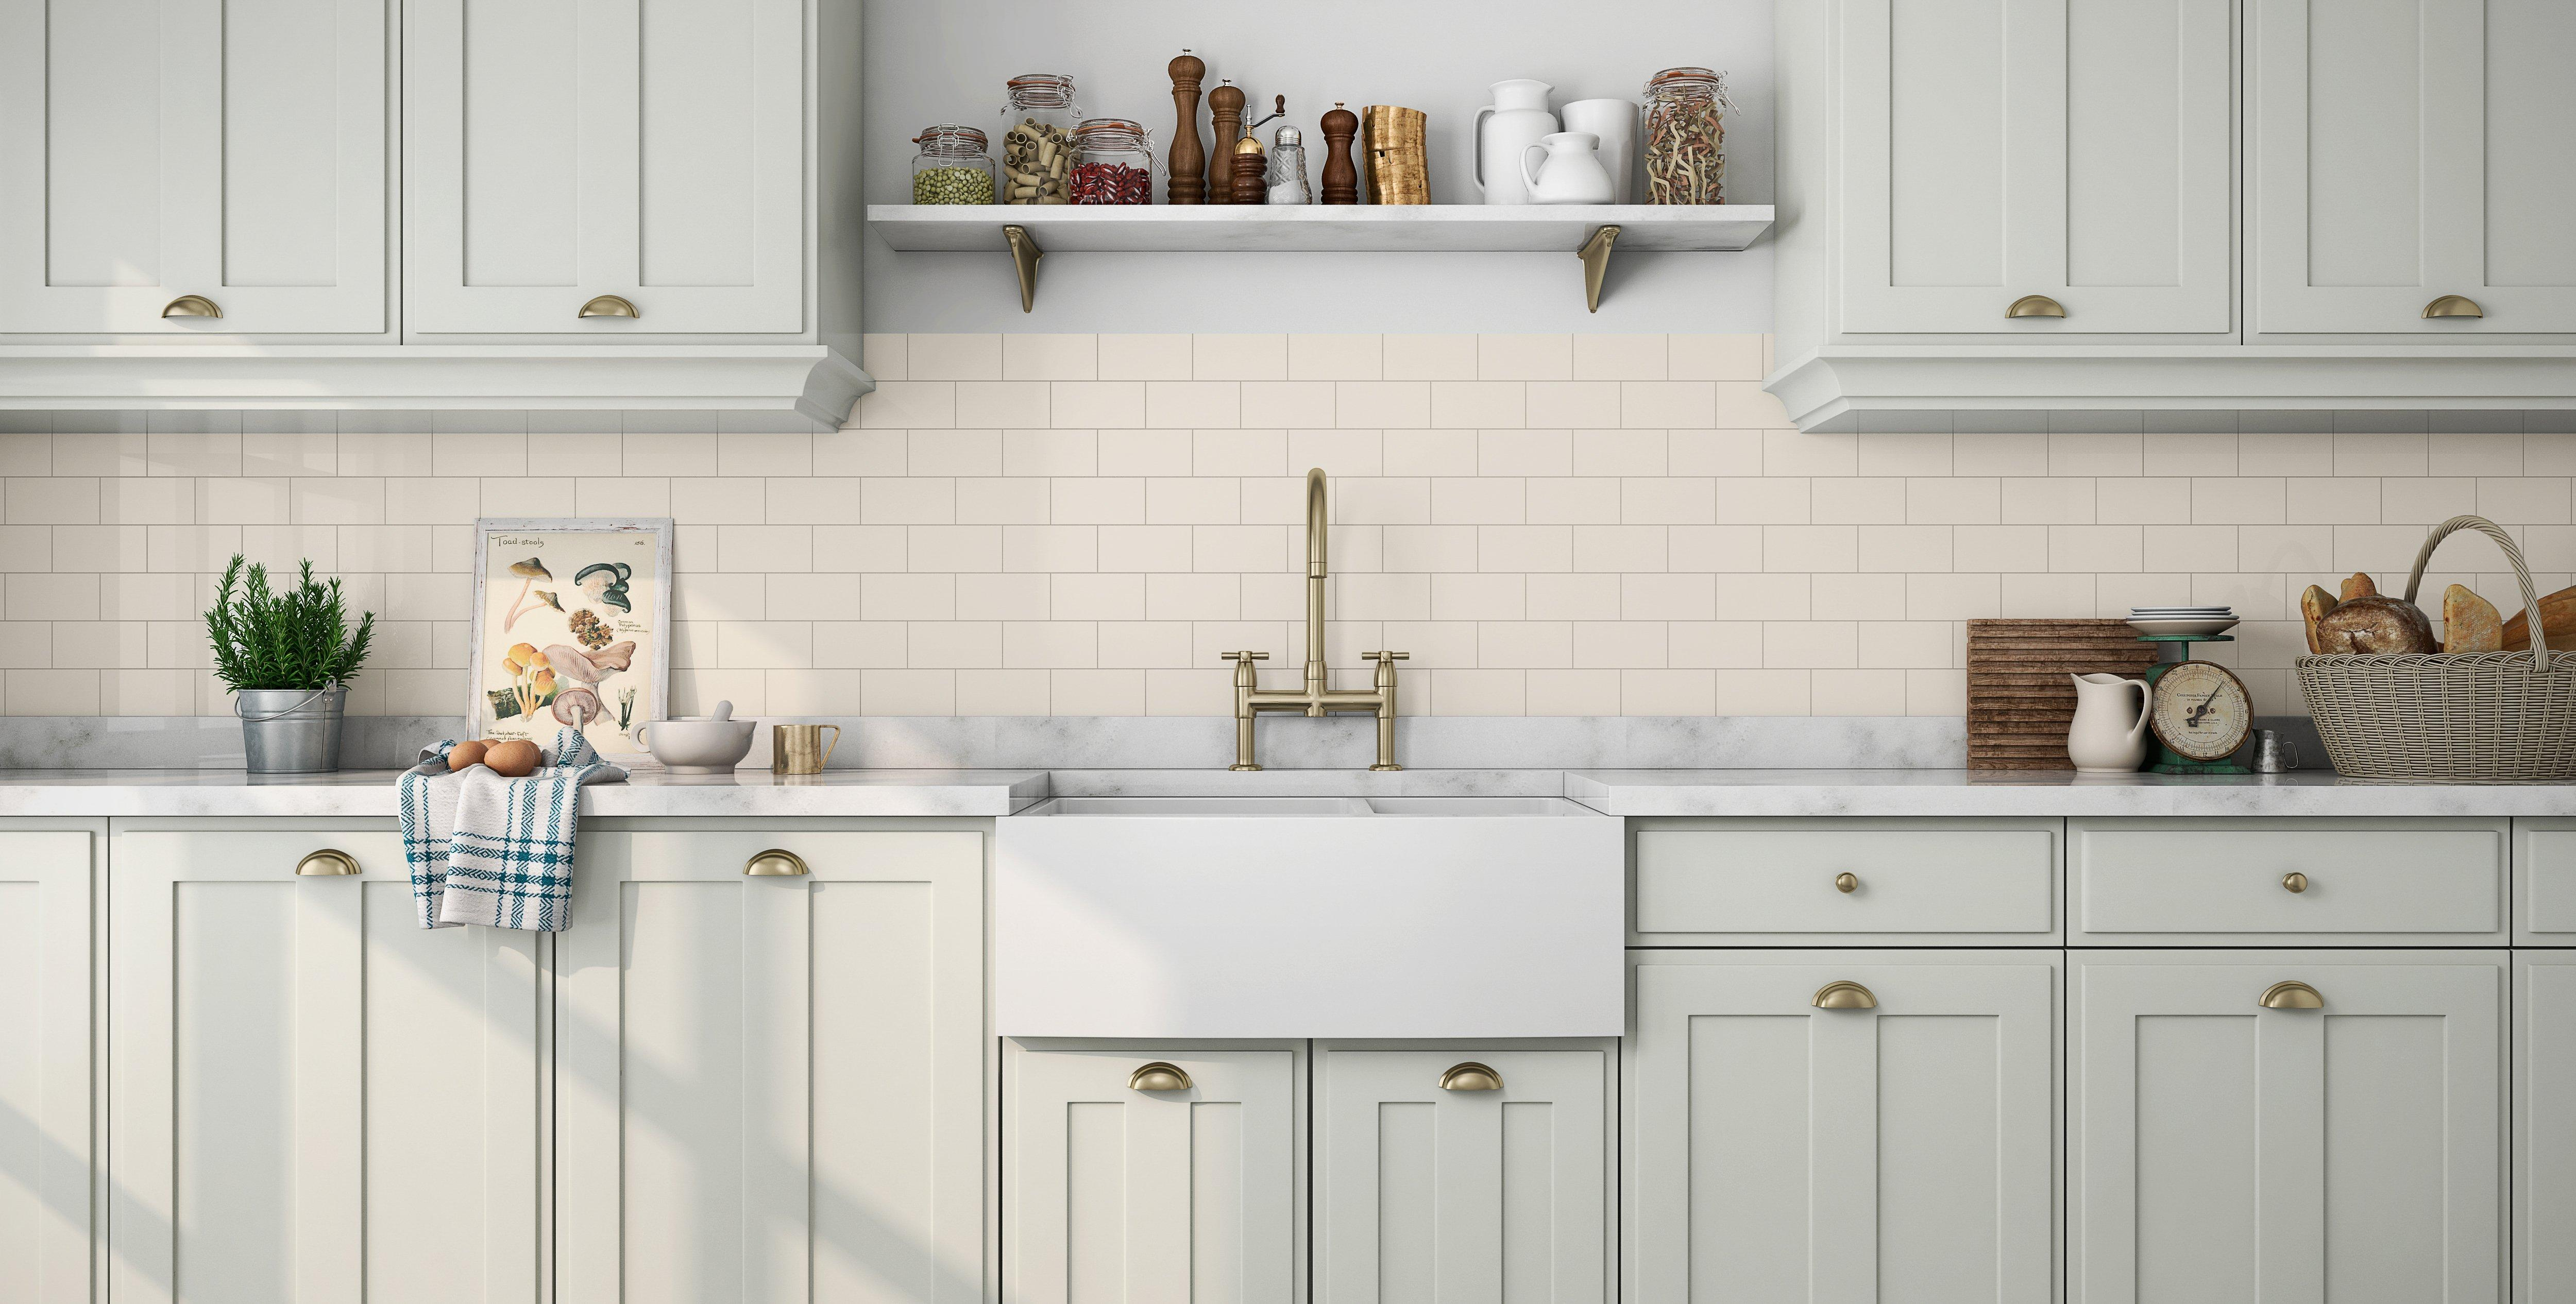 Ceramic Wall Tiles Kitchen 10x15 Kitchen Wall Tiles at Rs 90 box ...